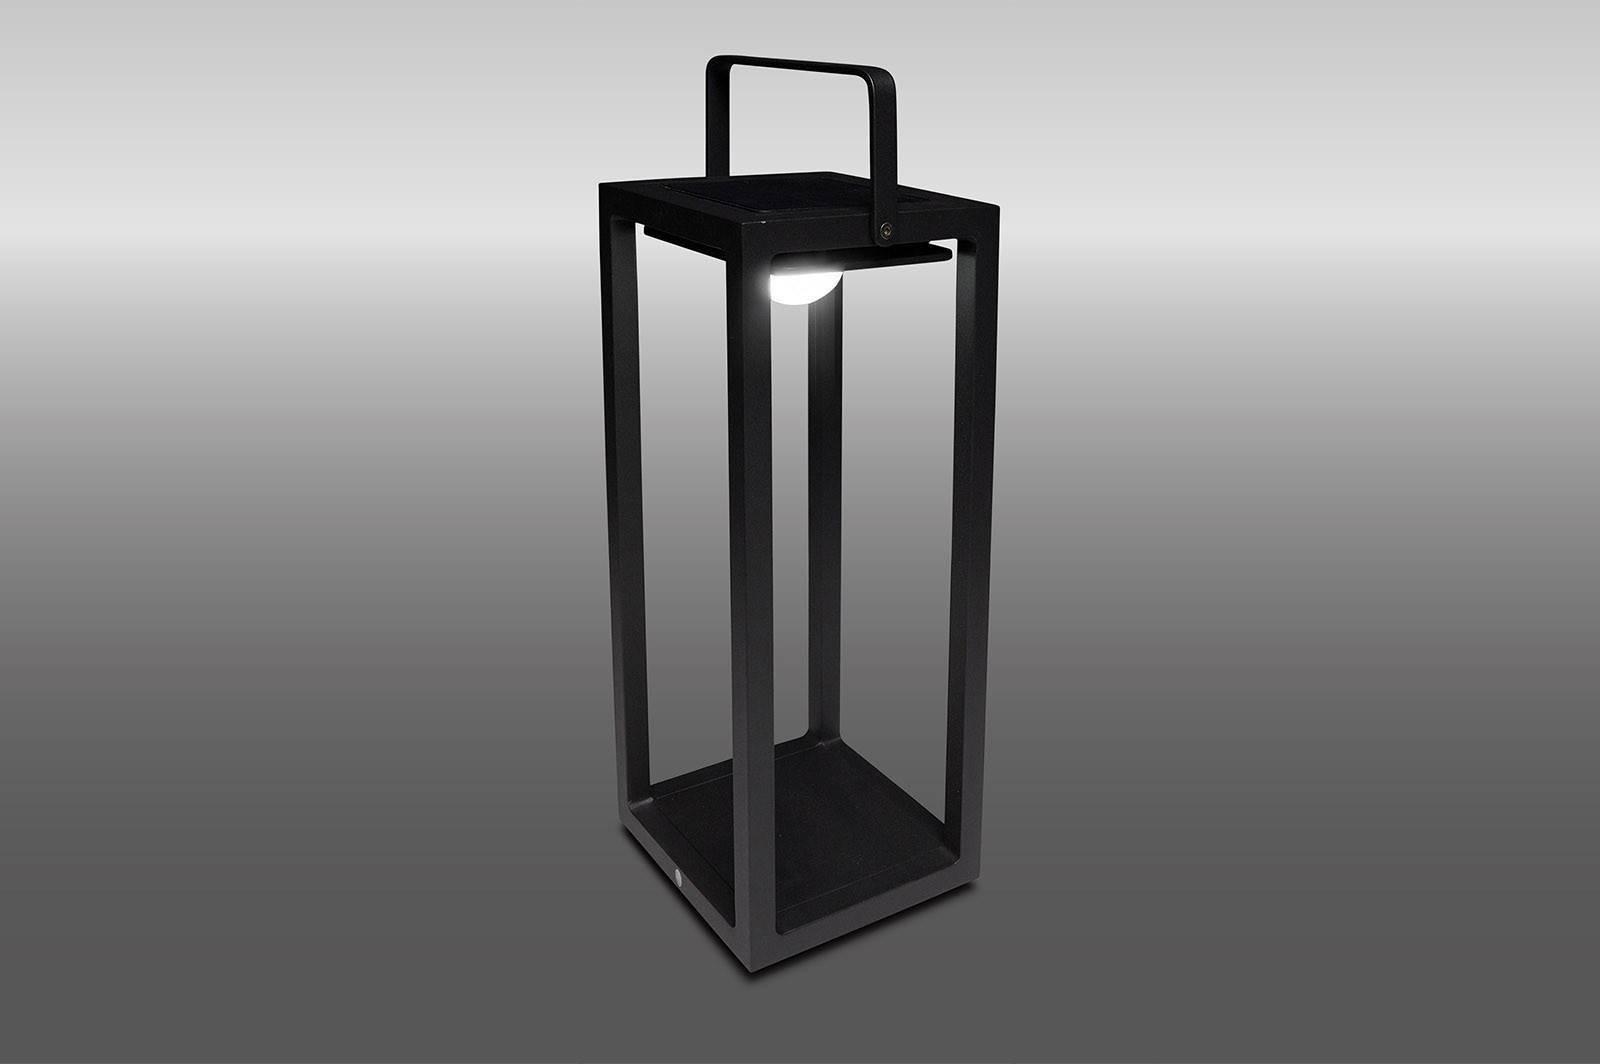 SOLÁRNÍ LAMPA JACK ROYAL GREY 20X20X50 CM